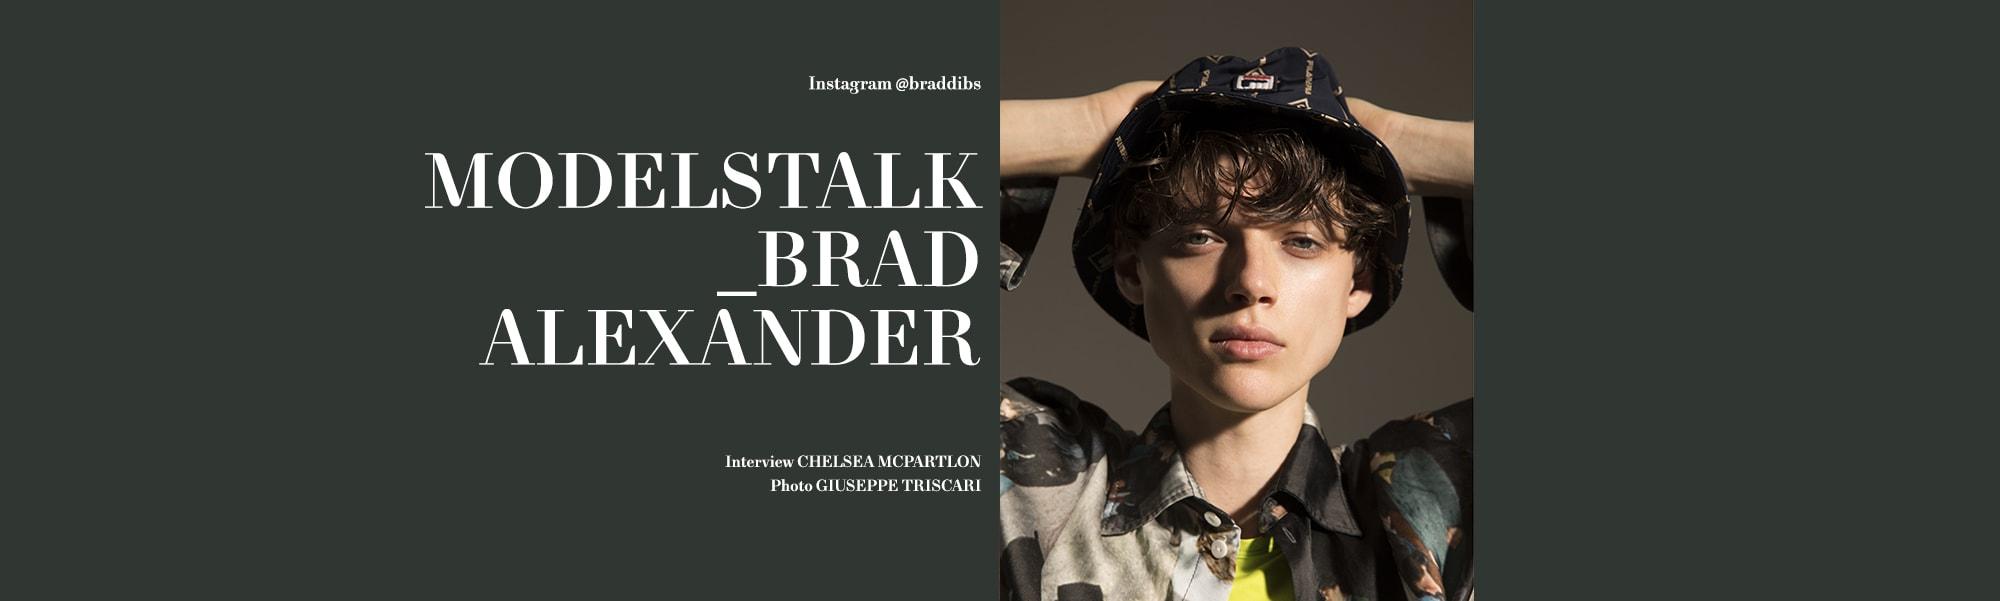 TheGreatestMagazine_TalkingHeads_BradAlexander_Banner